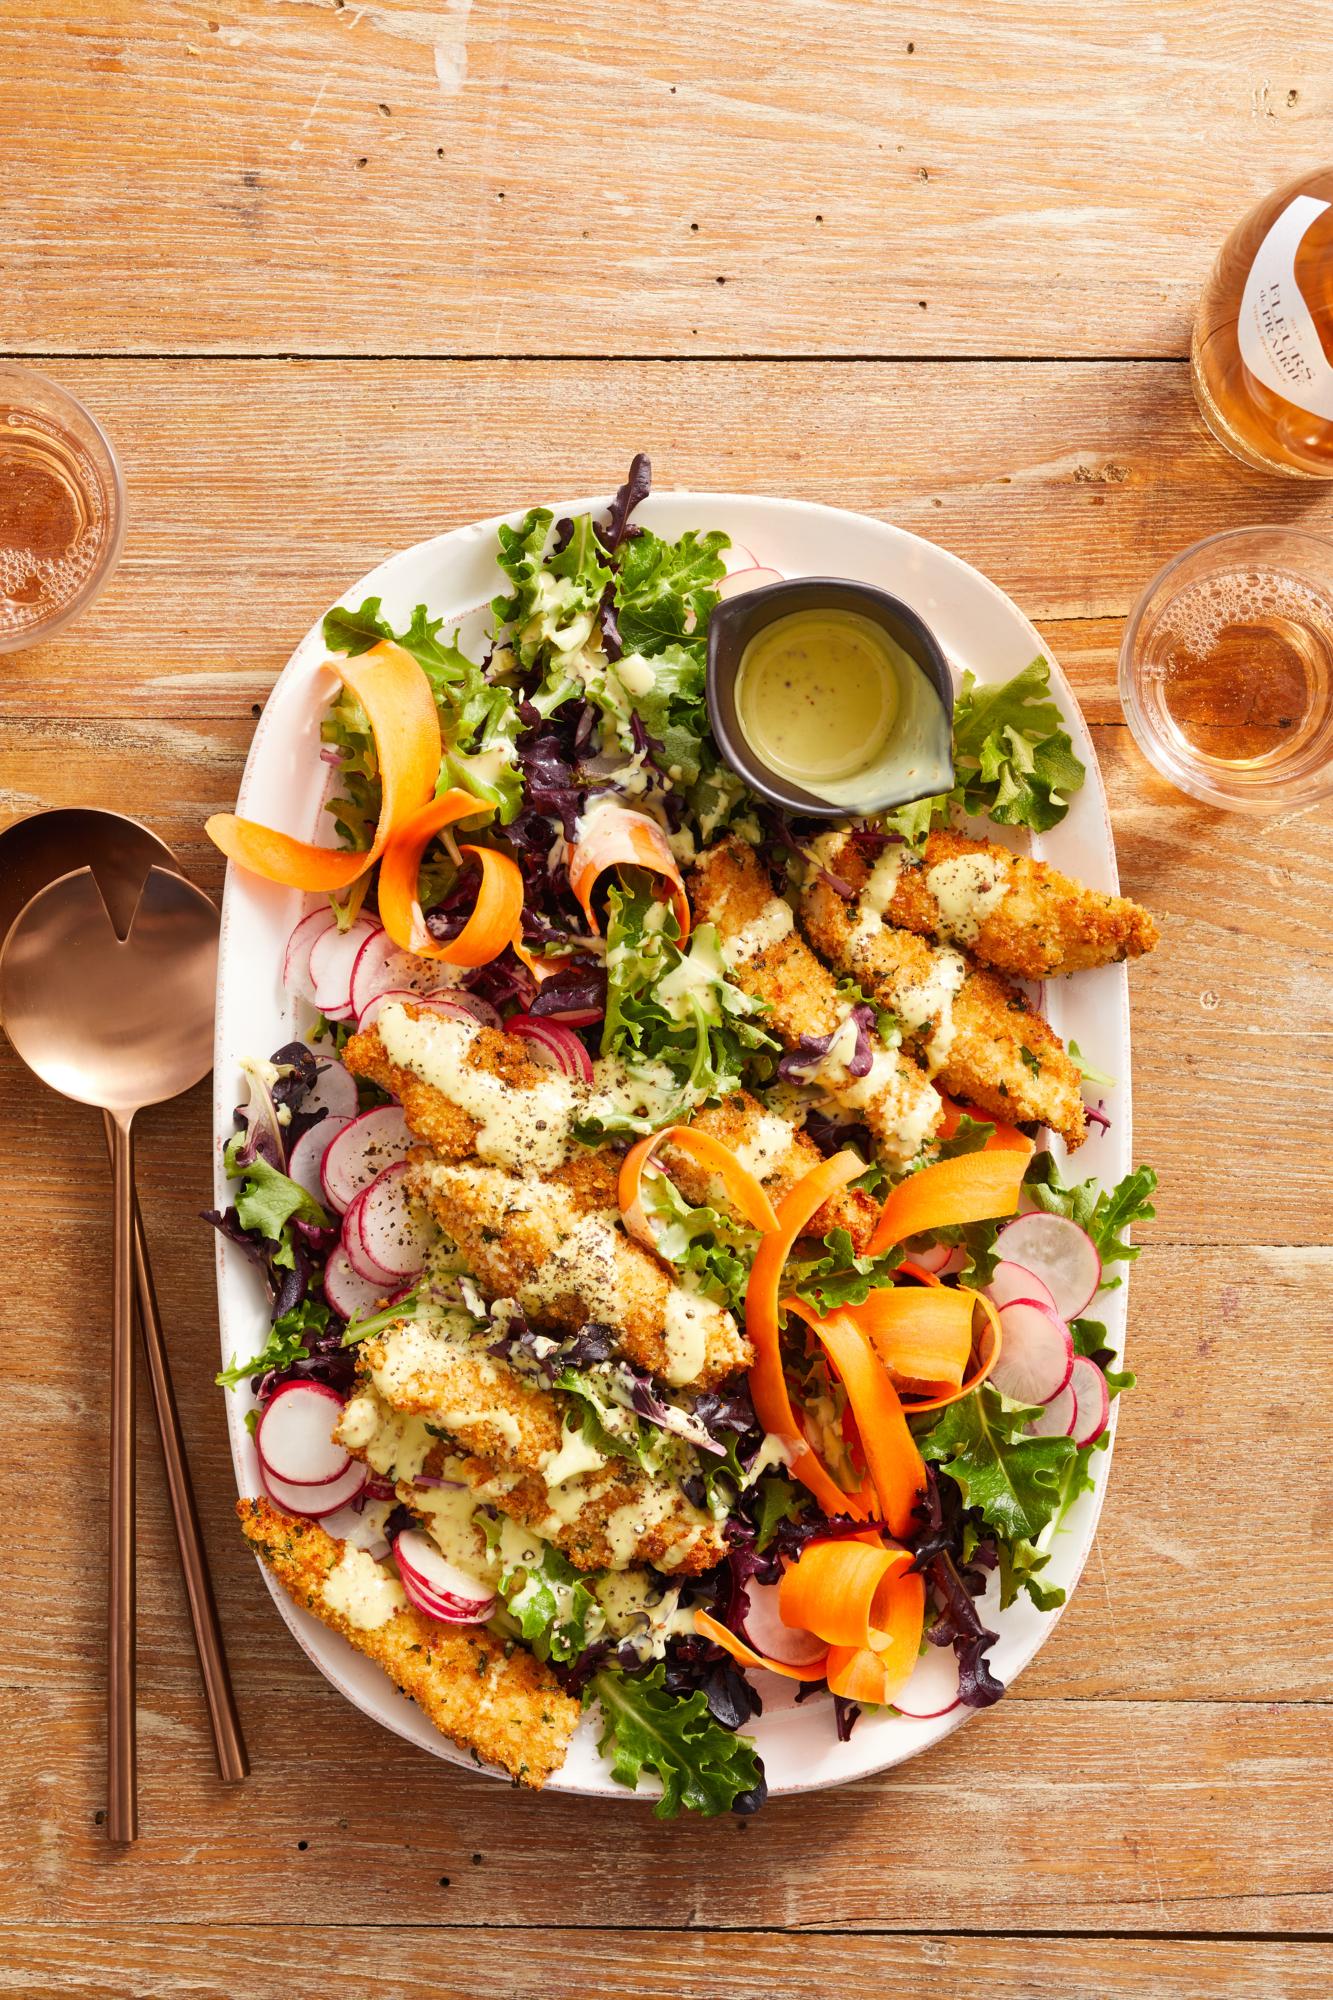 Crispy Chicken Salad with Yummy Honey Mustard Dressing